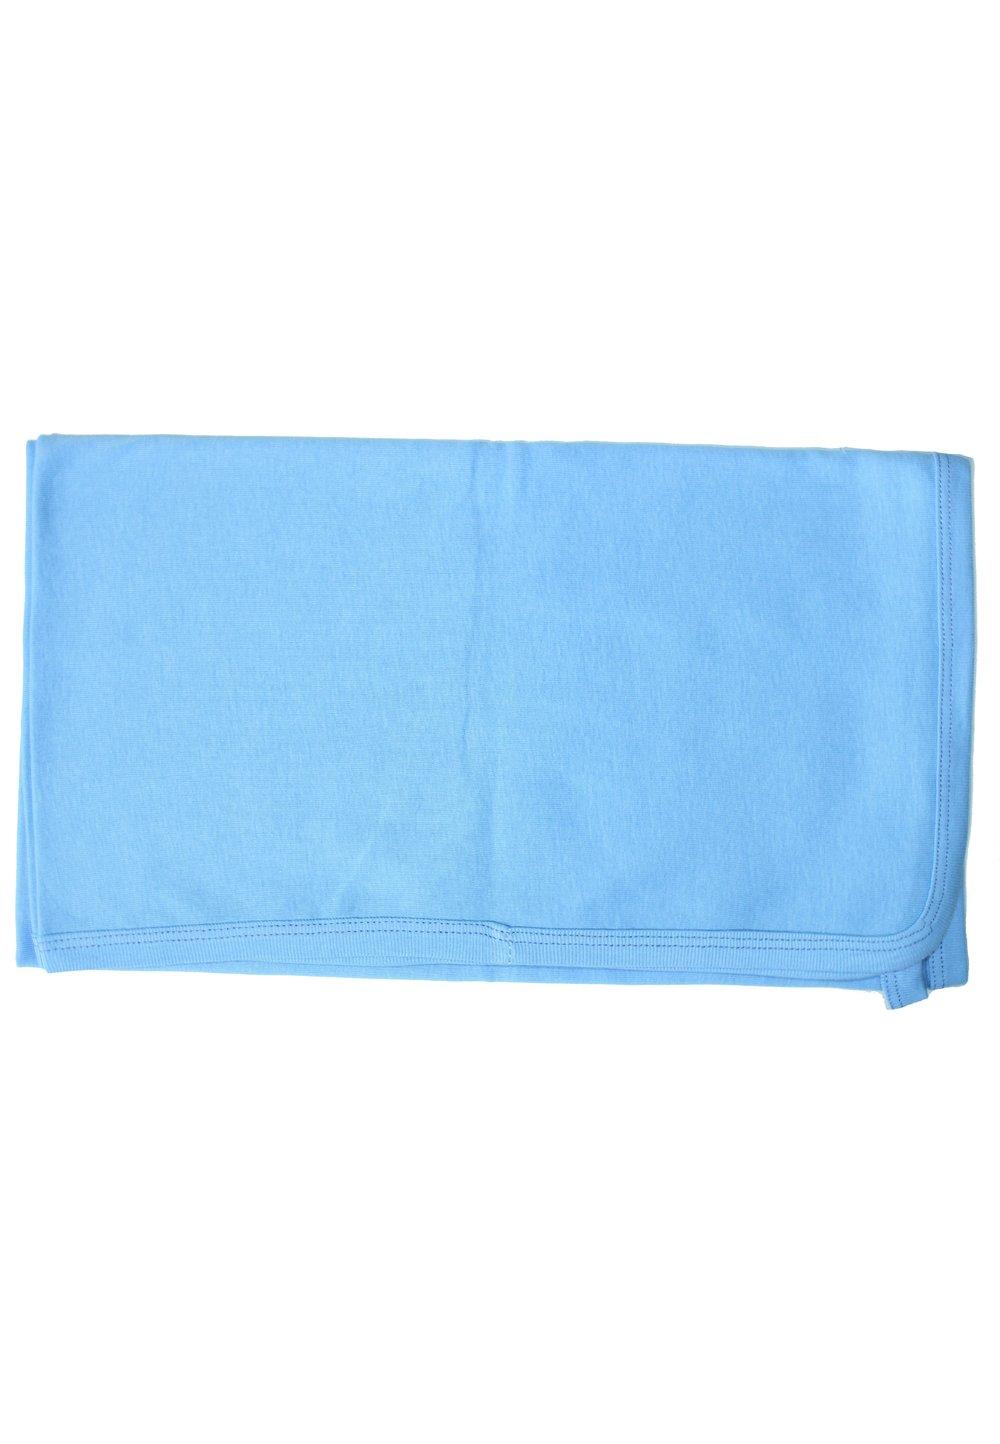 Pled bebe albastru, 95x75 cm imagine